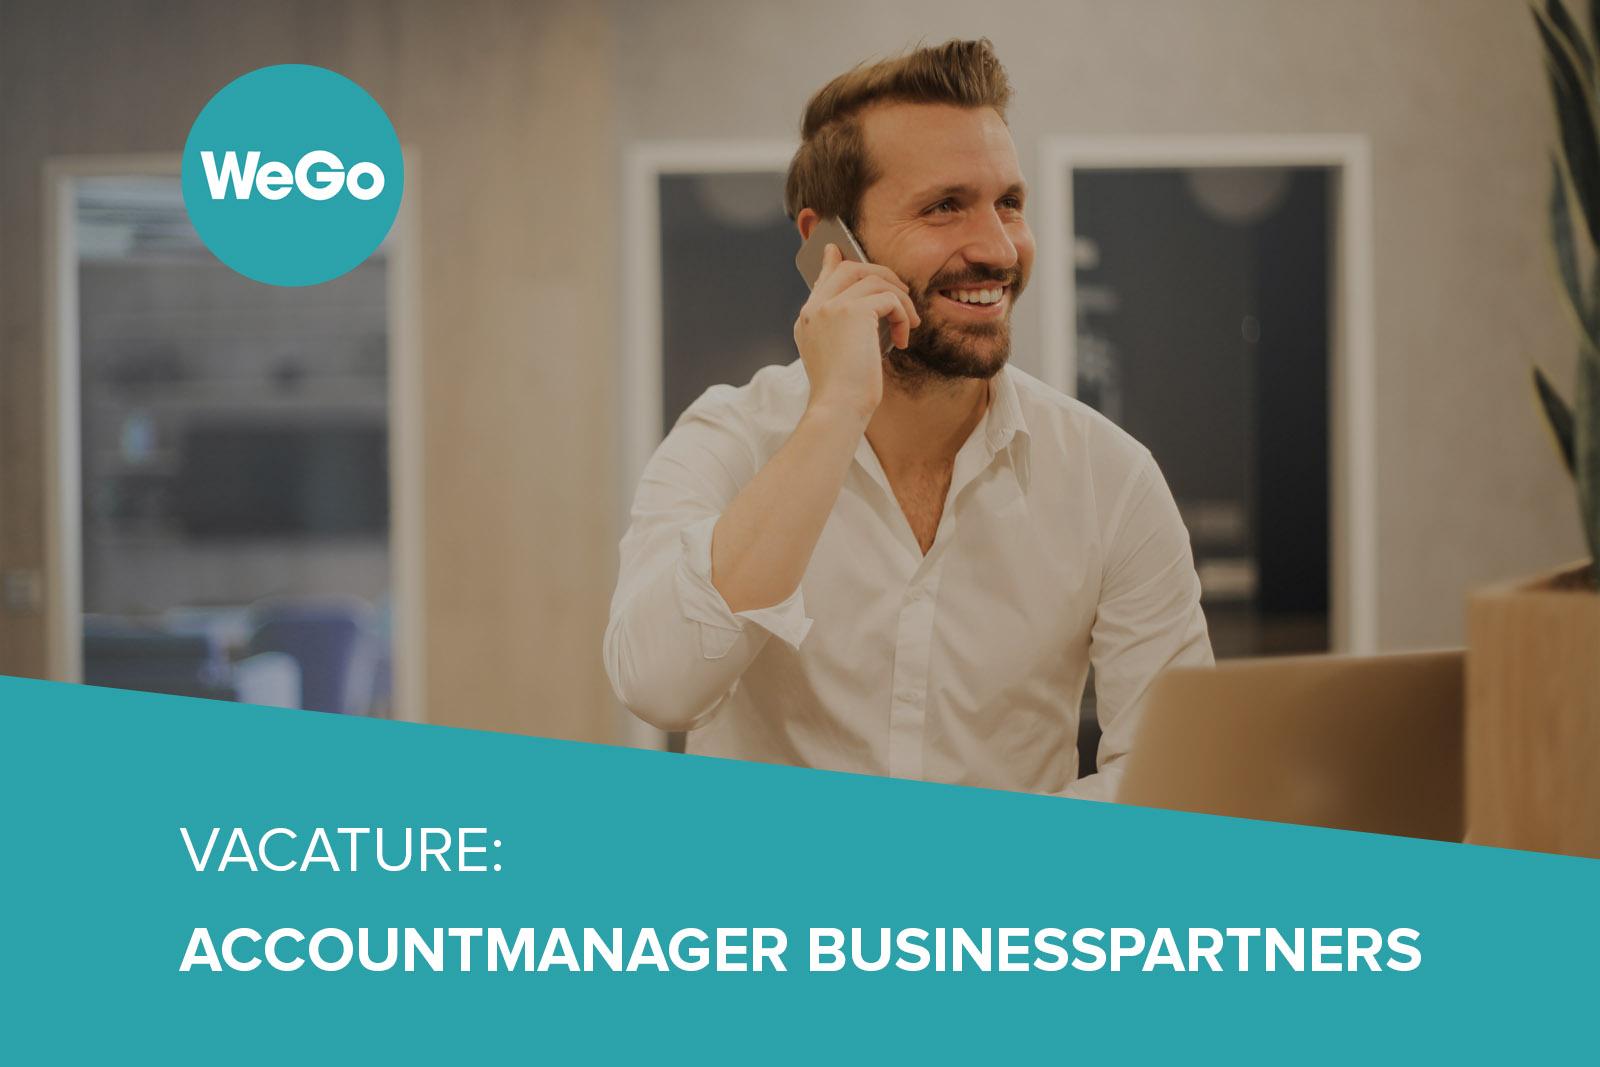 Vacature WeGo Accountmanager Businesspartners